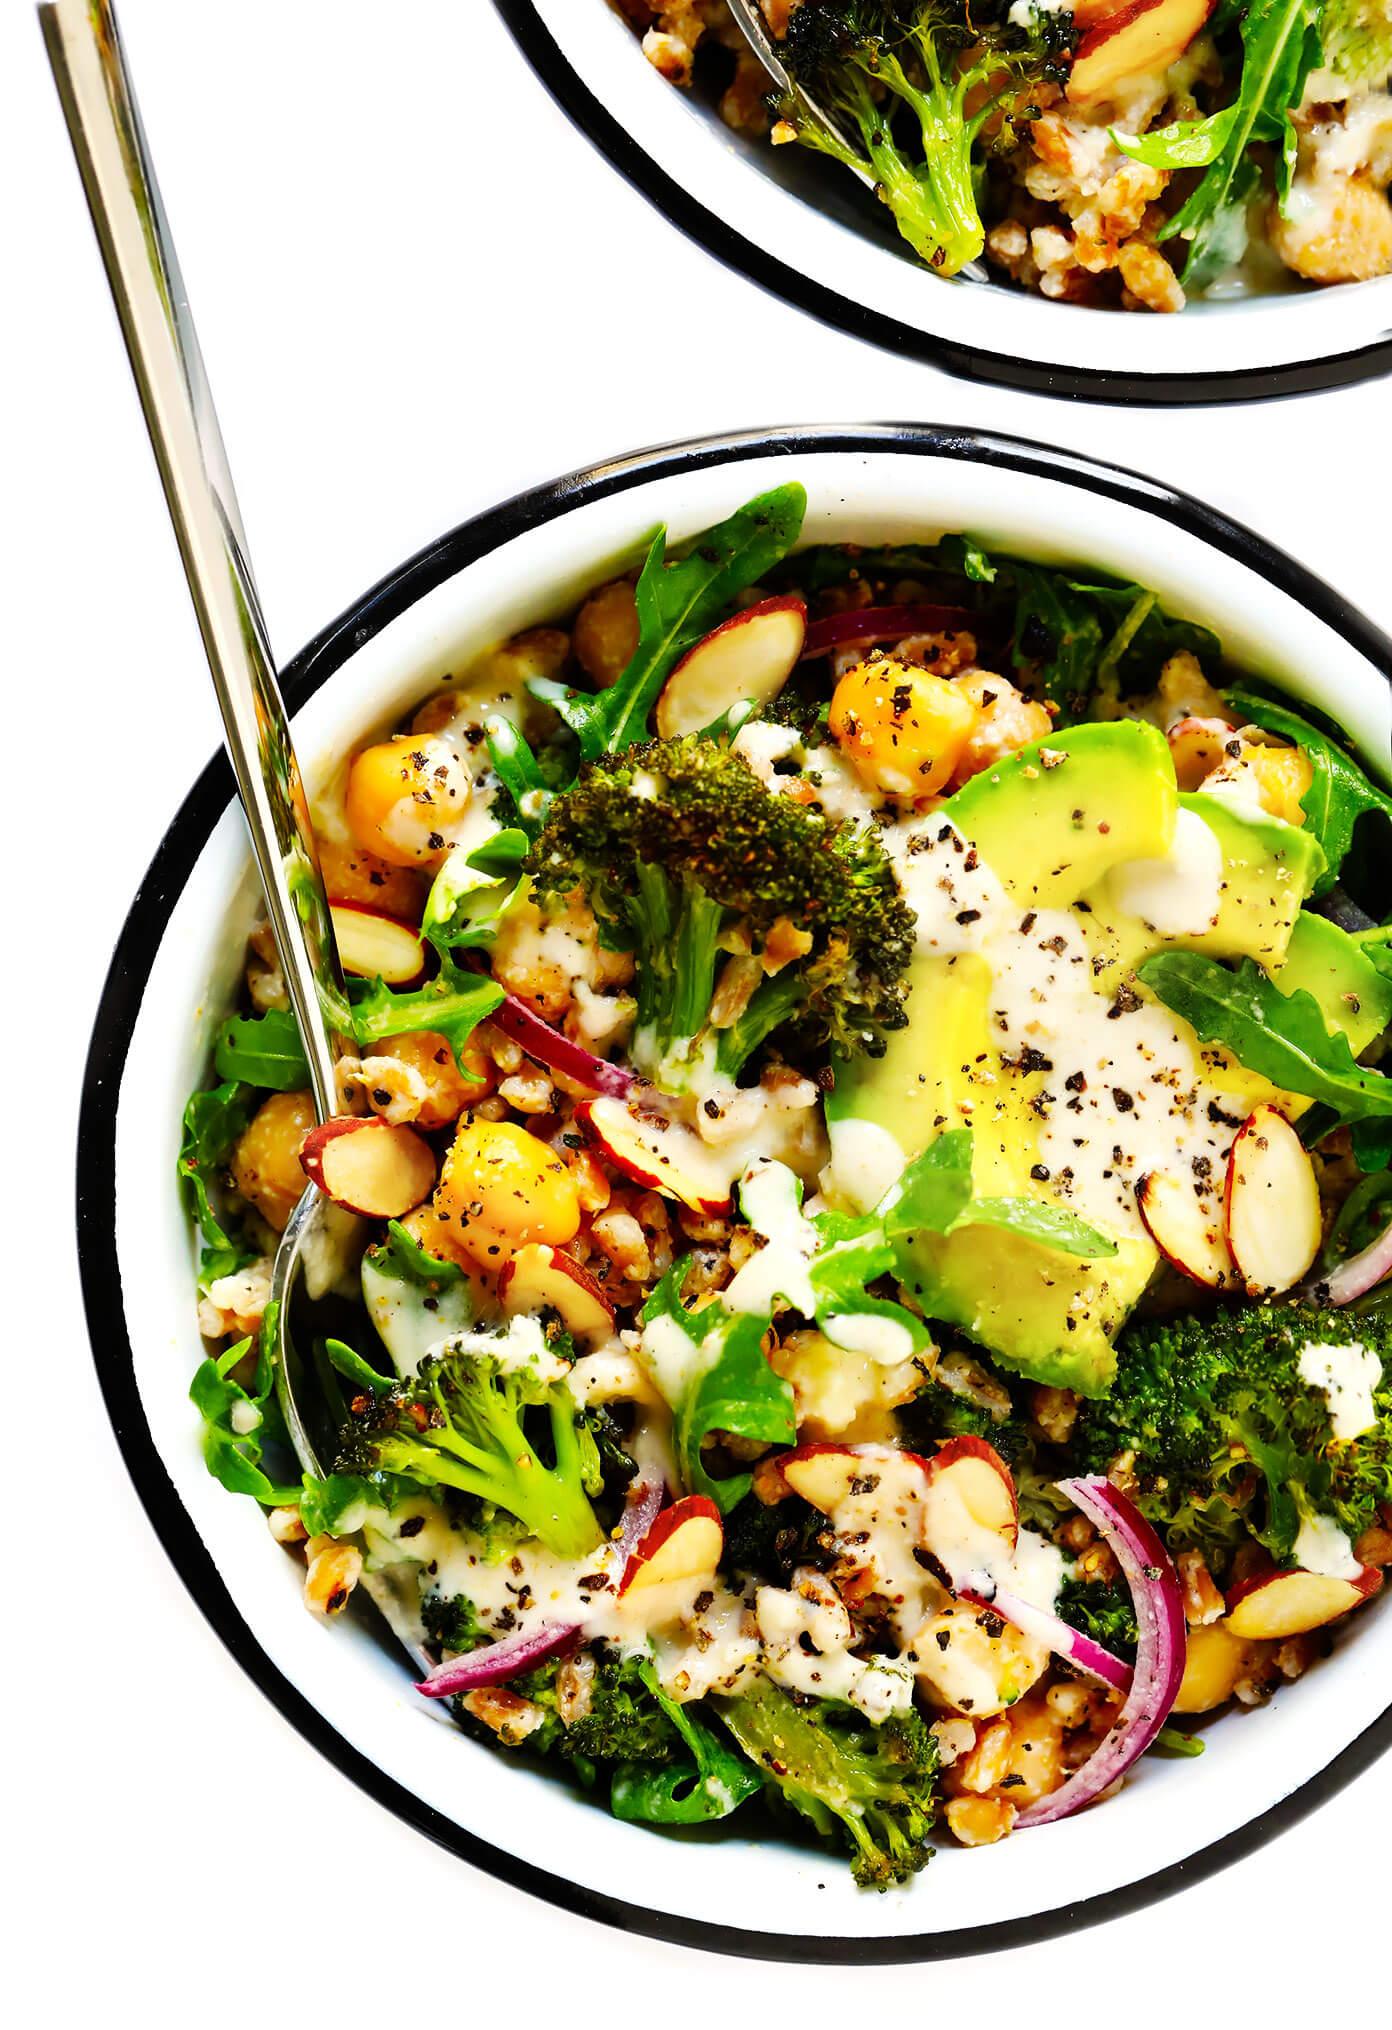 Roasted Broccoli and Farro Bowls